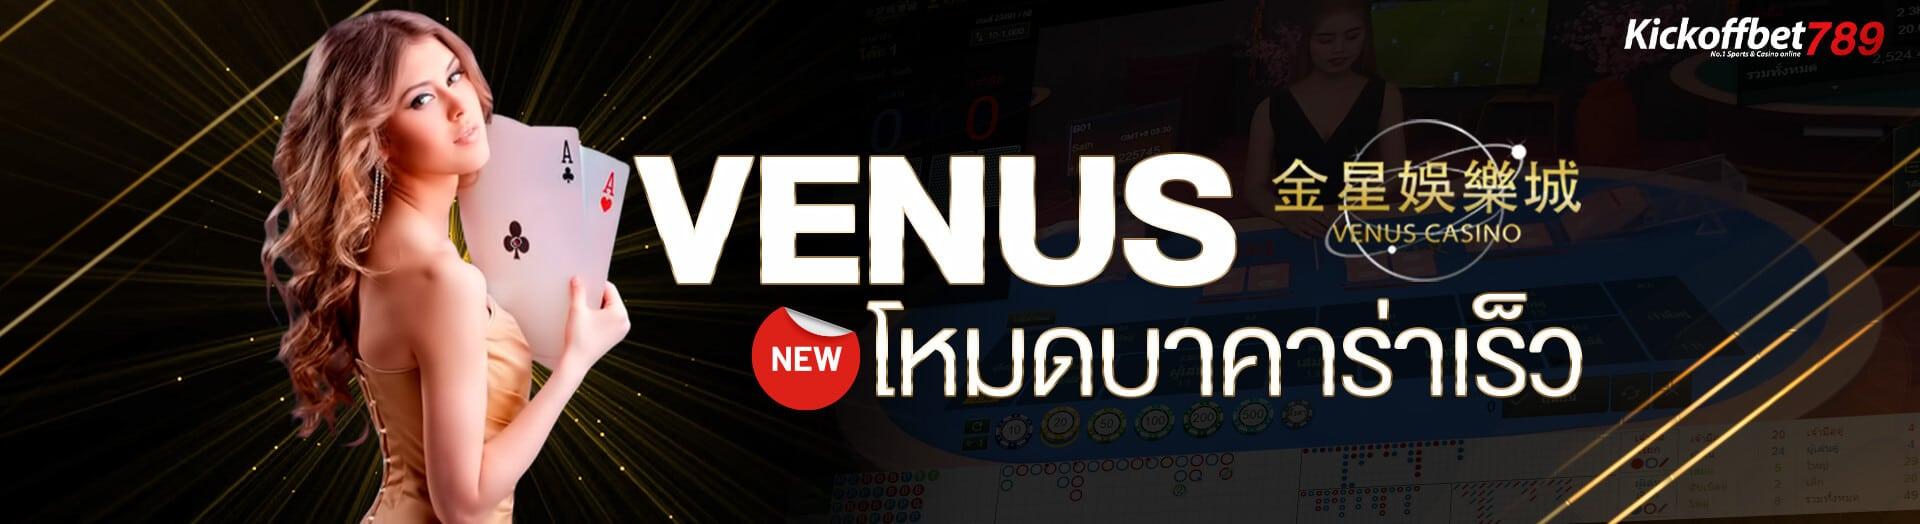 Venuscasino-ปก2